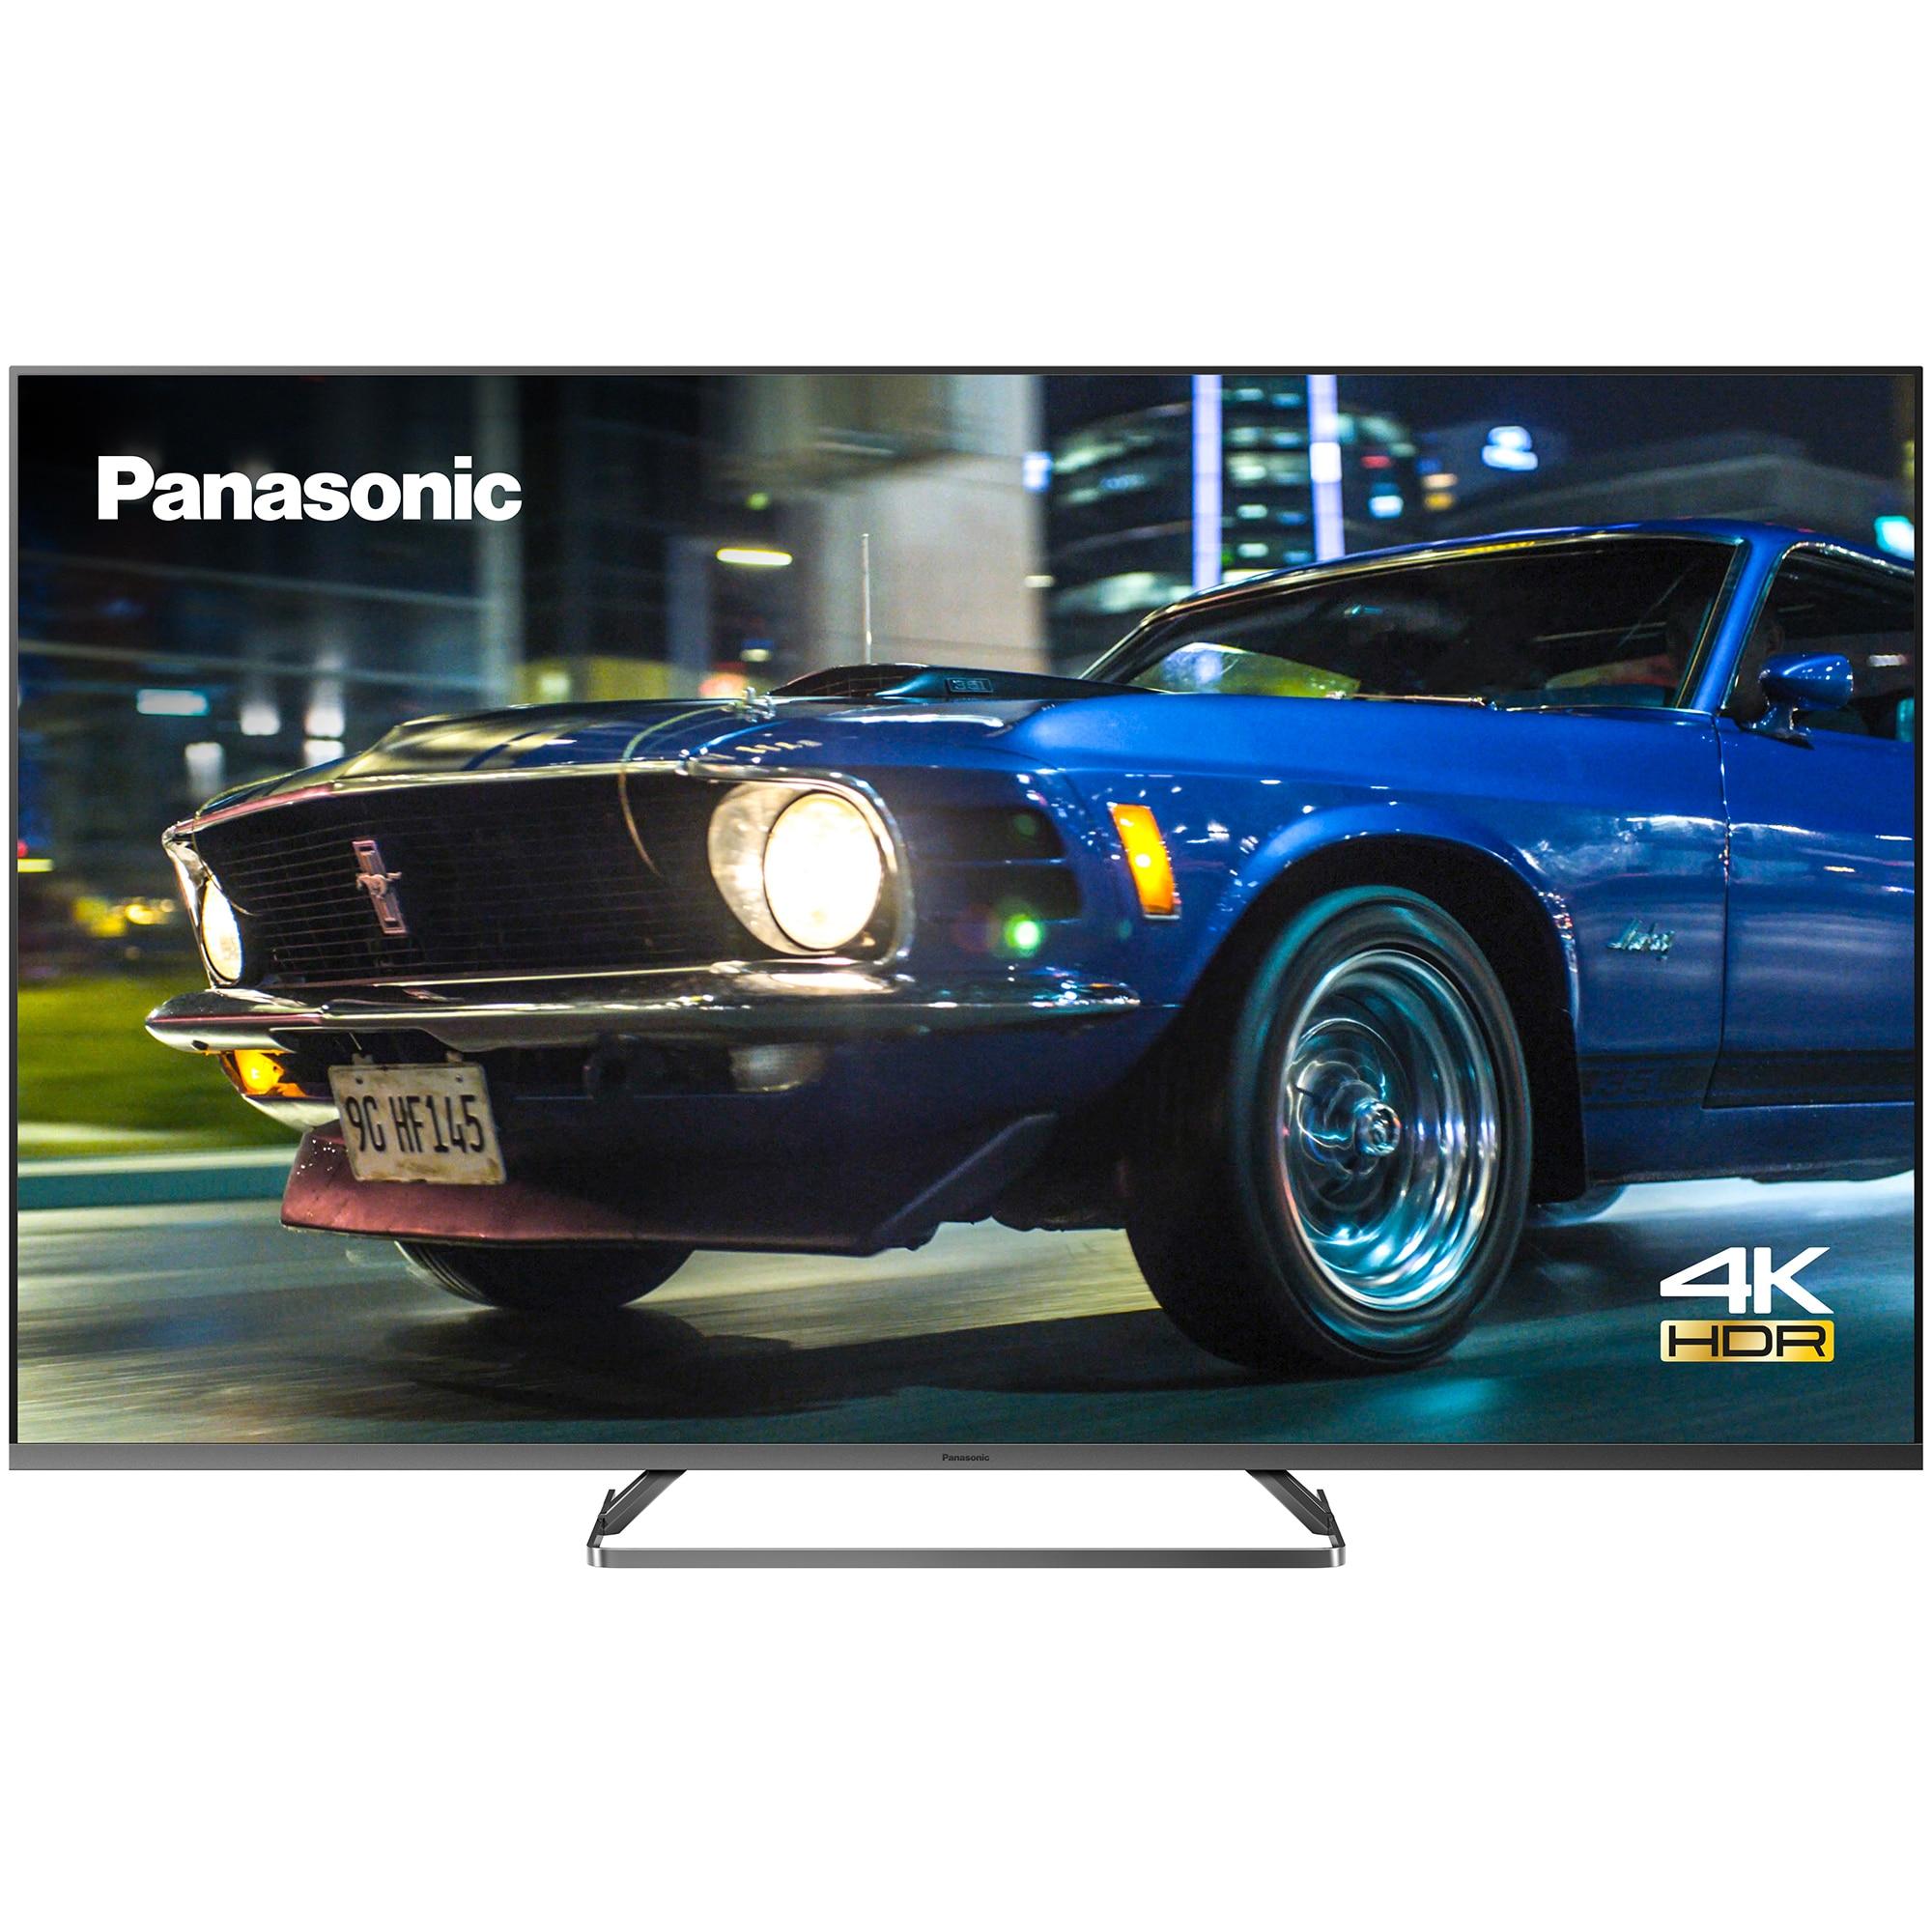 Fotografie Televizor Panasonic TX-50HX810E, 126 cm, Smart, 4K Ultra HD, LED, Clasa F